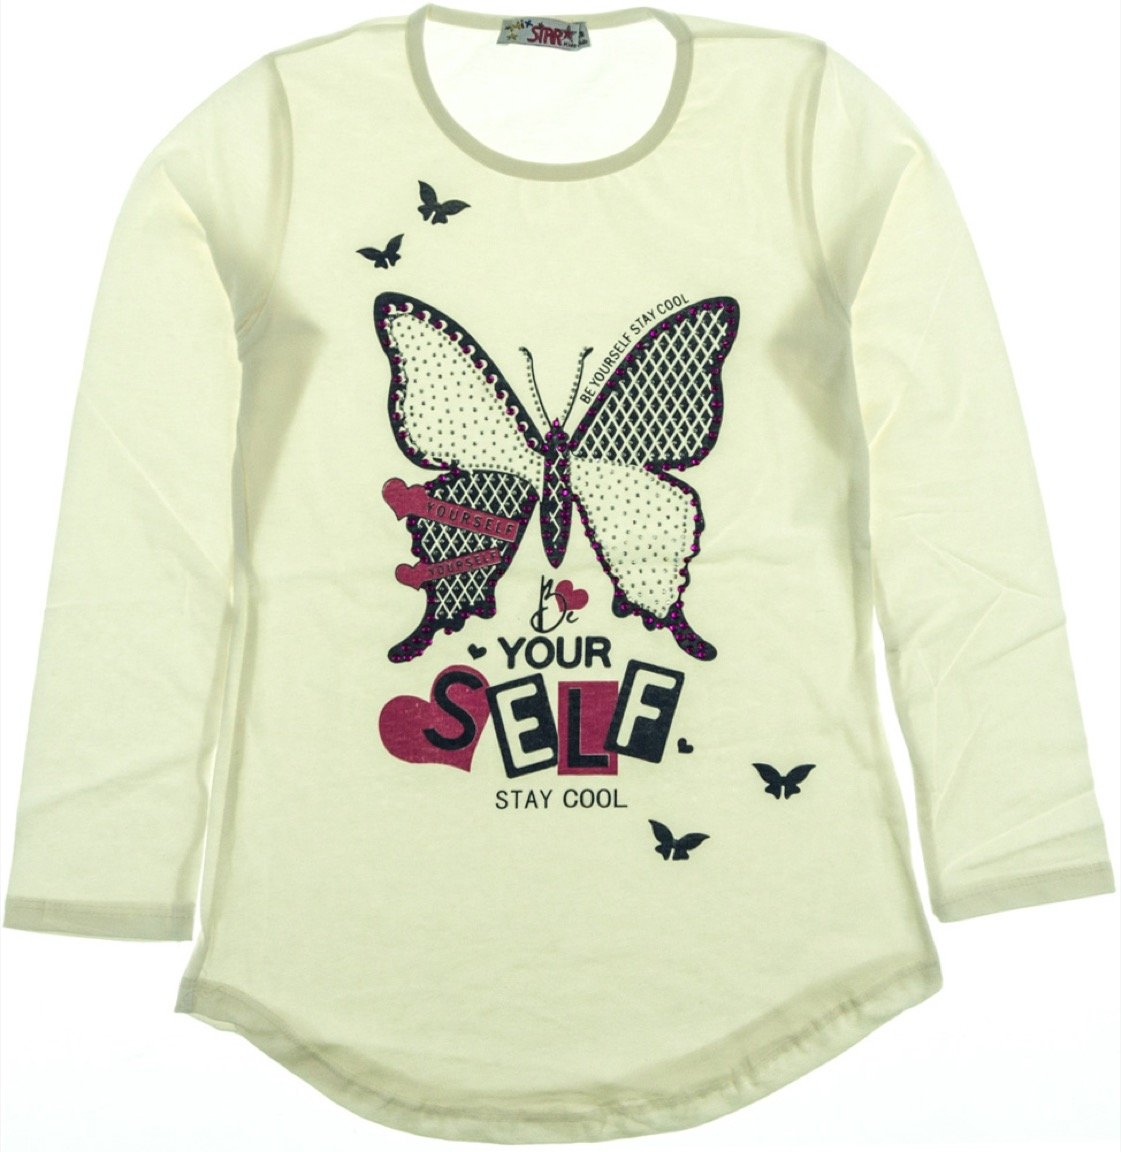 Mix Star παιδική εποχιακή μπλούζα «Be Yourself»